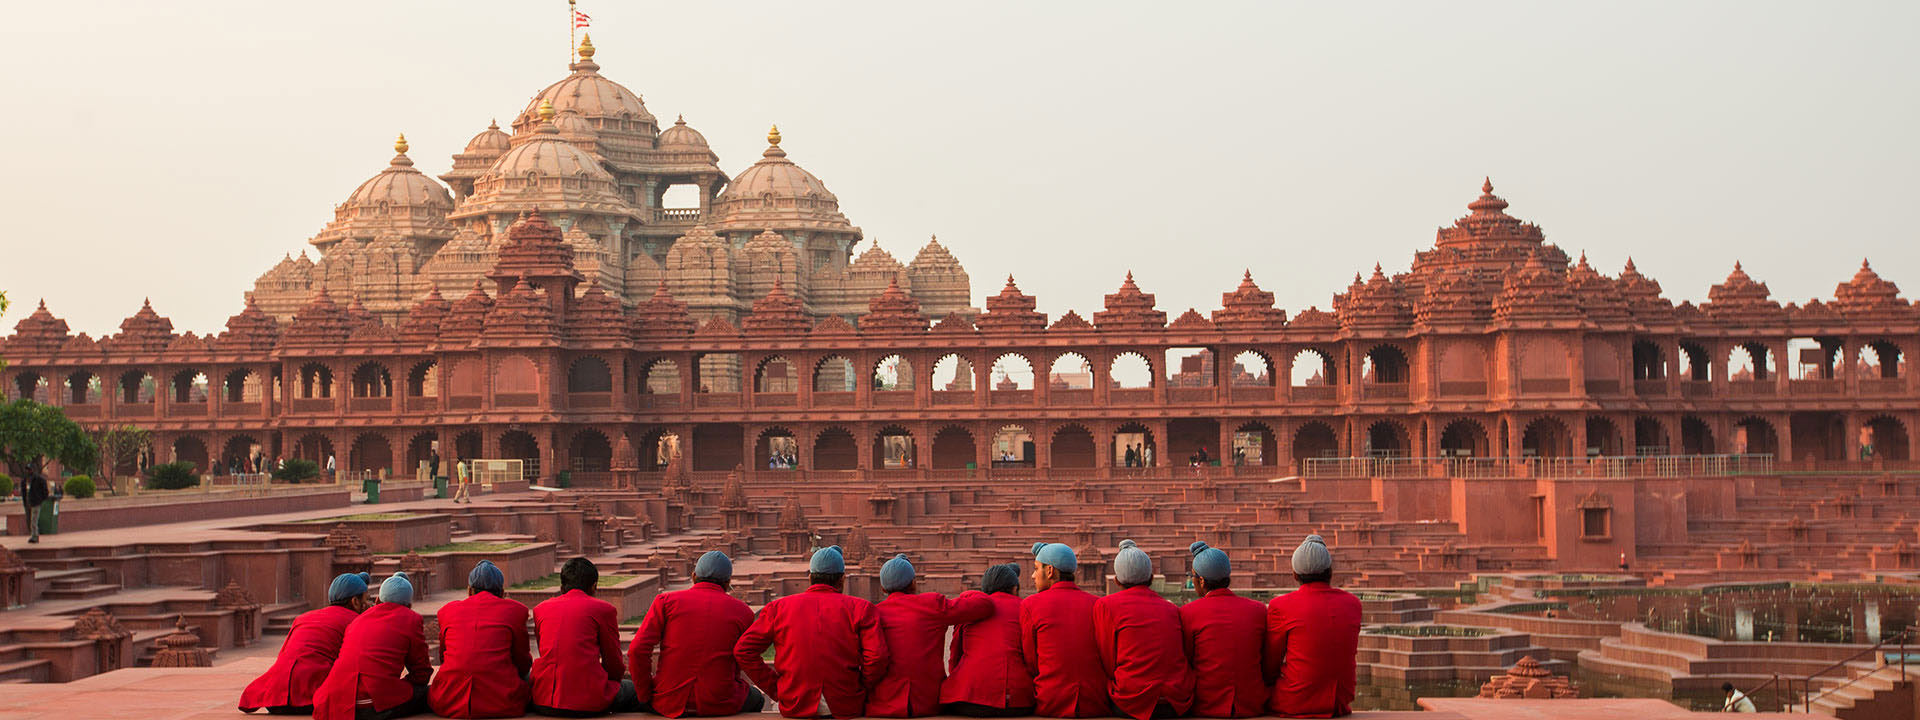 intenseindiatours-slider-Akshardham